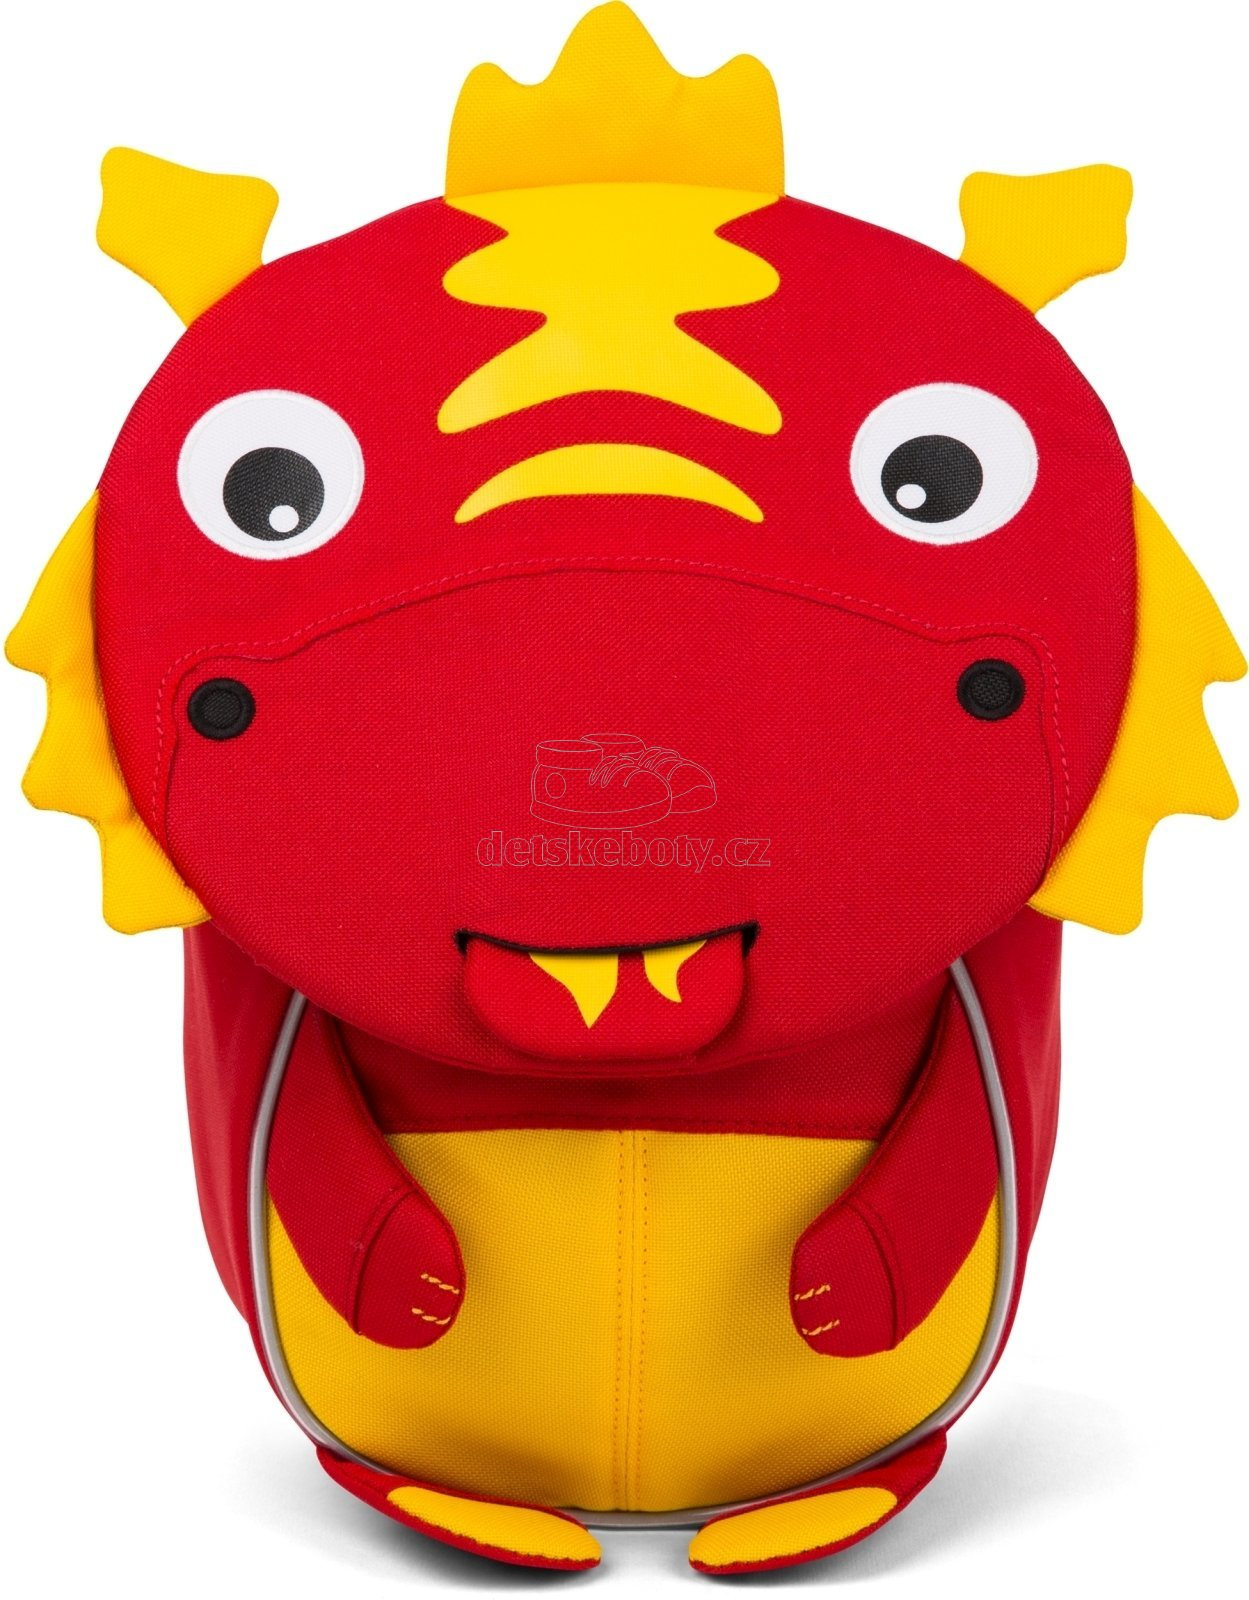 Batůžek pro nejmenší Affenzahn Dario Dragon small - red